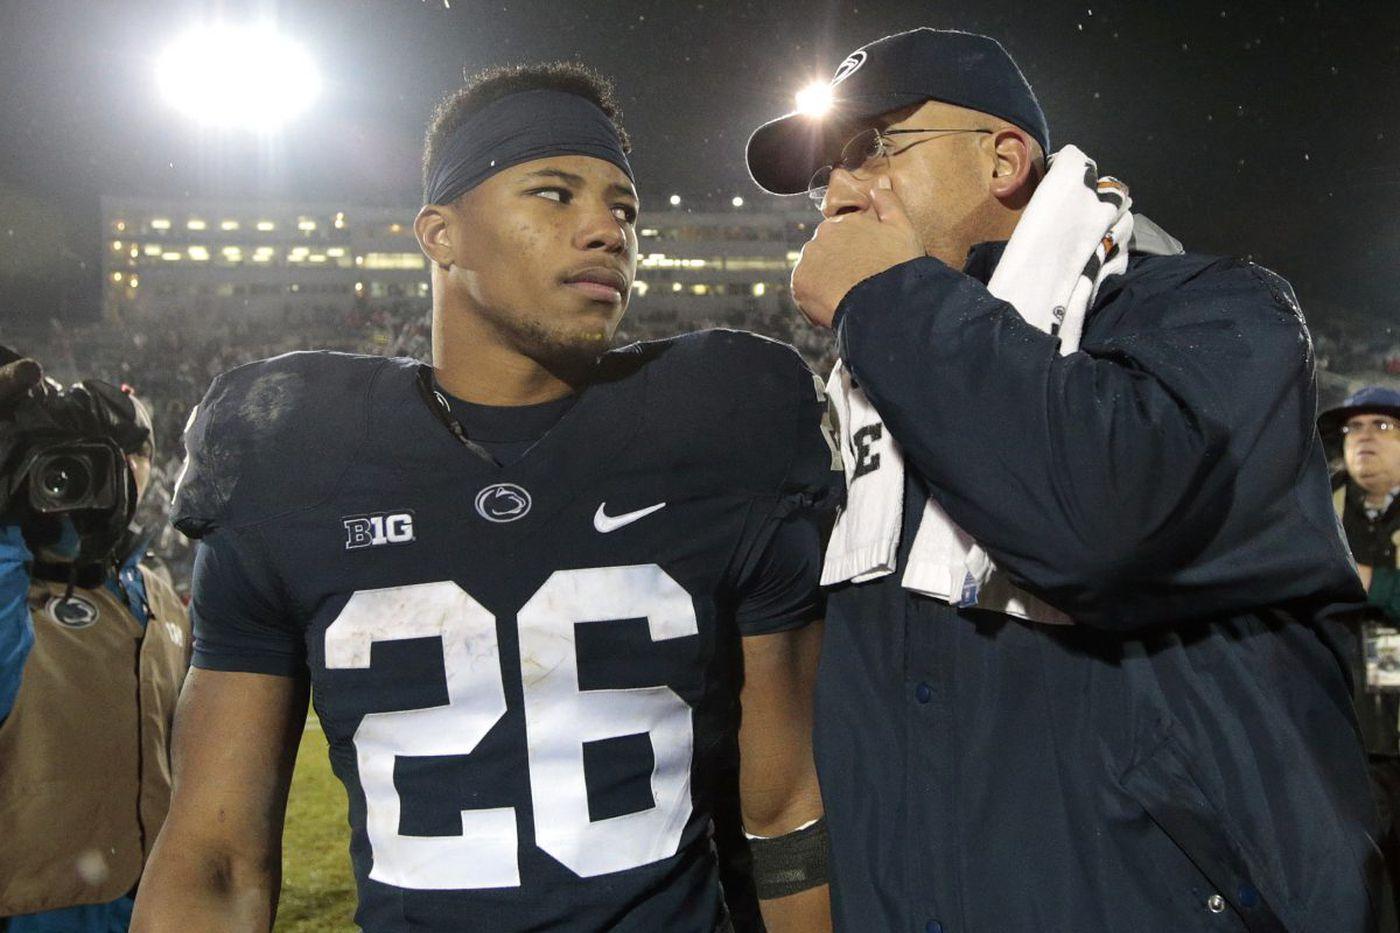 James Franklin appreciates Saquon Barkley's tough runs for Penn State